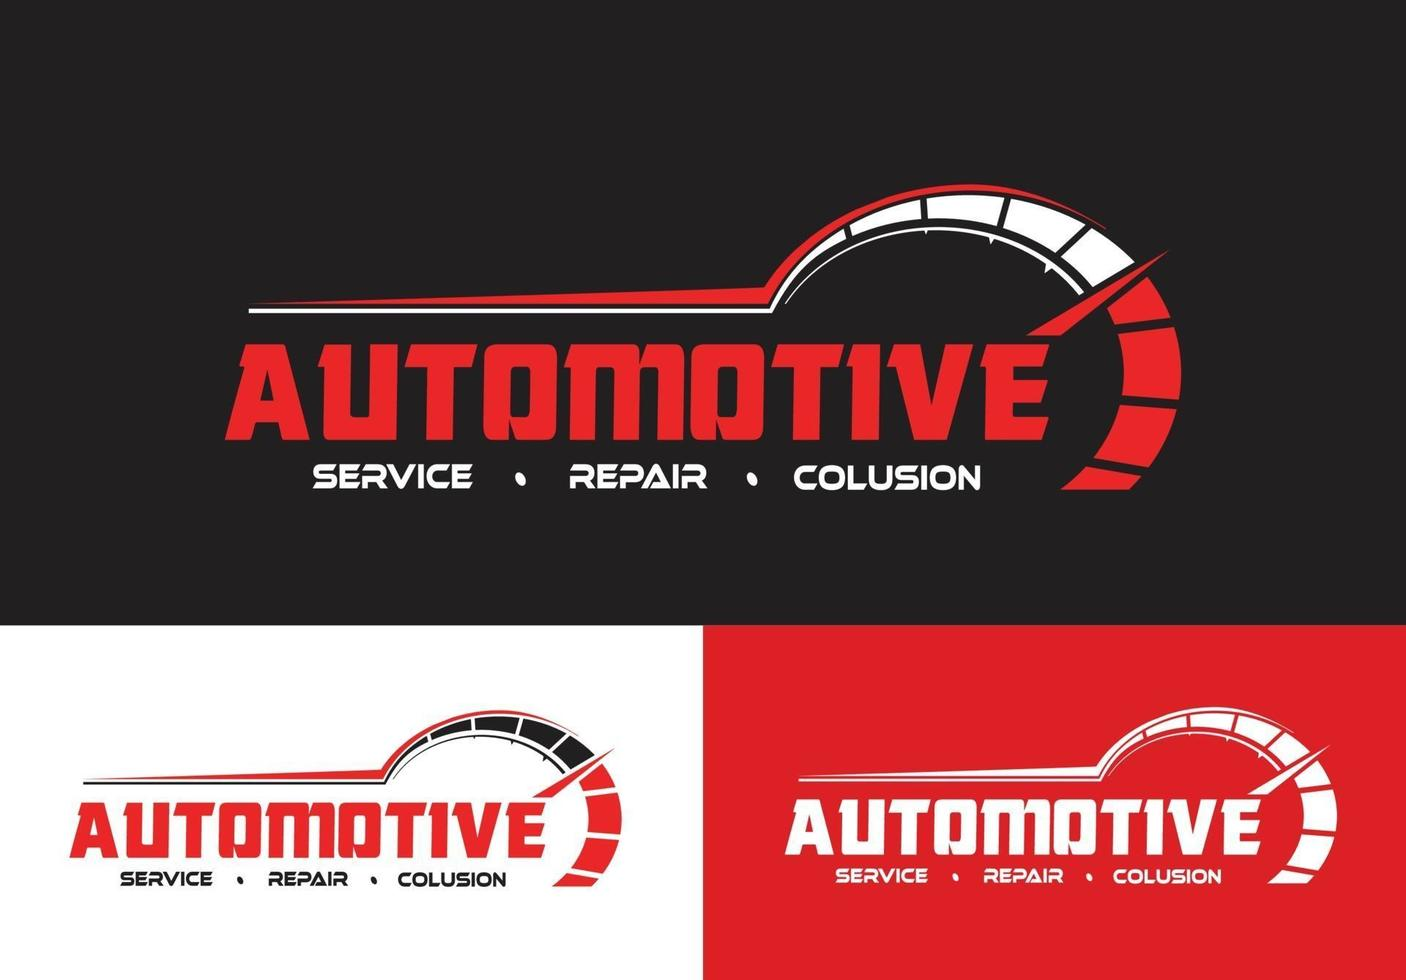 automotive repair and service logo concept vector